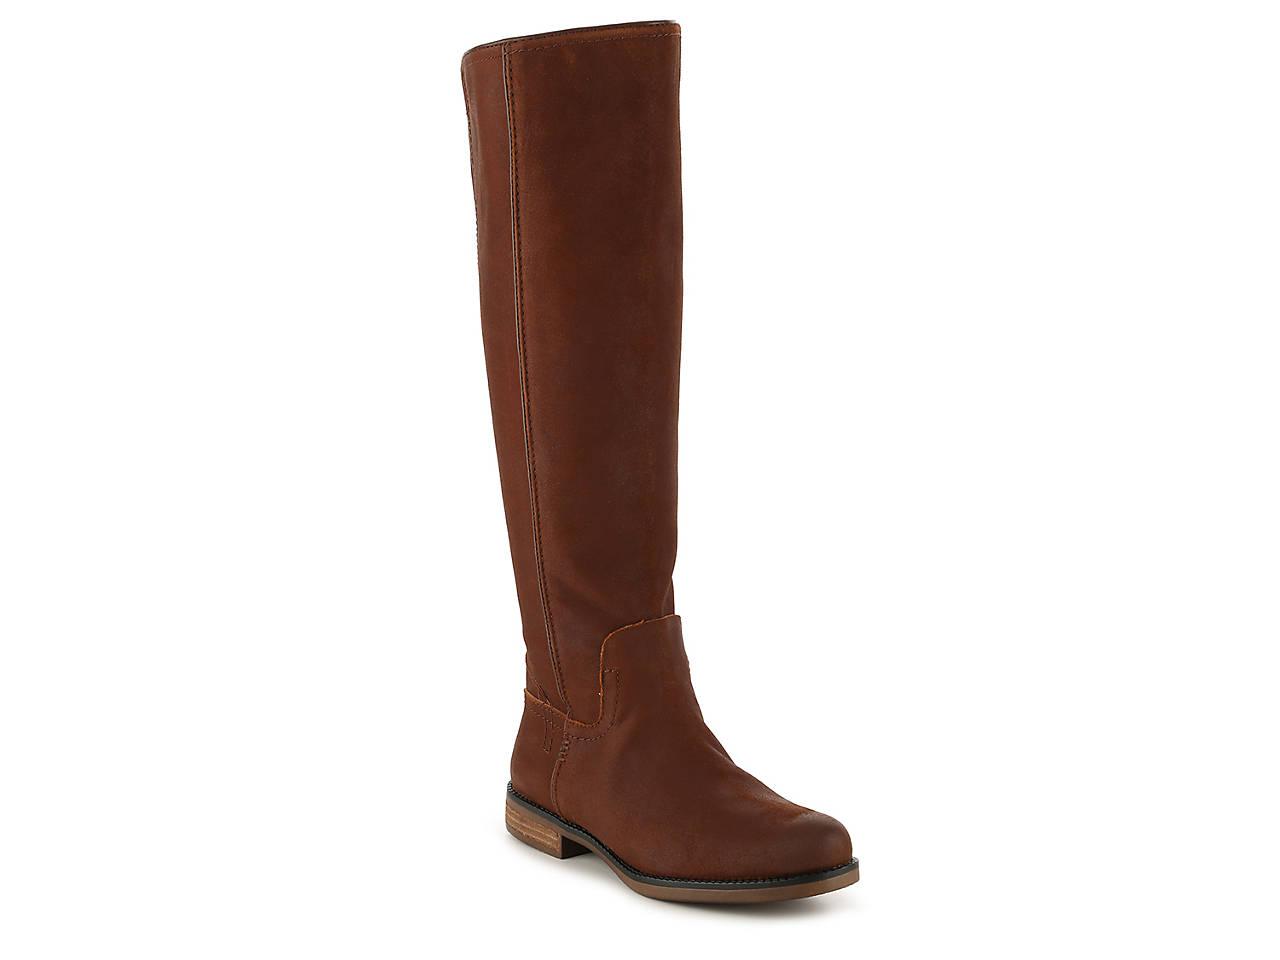 Chandra Riding Boot